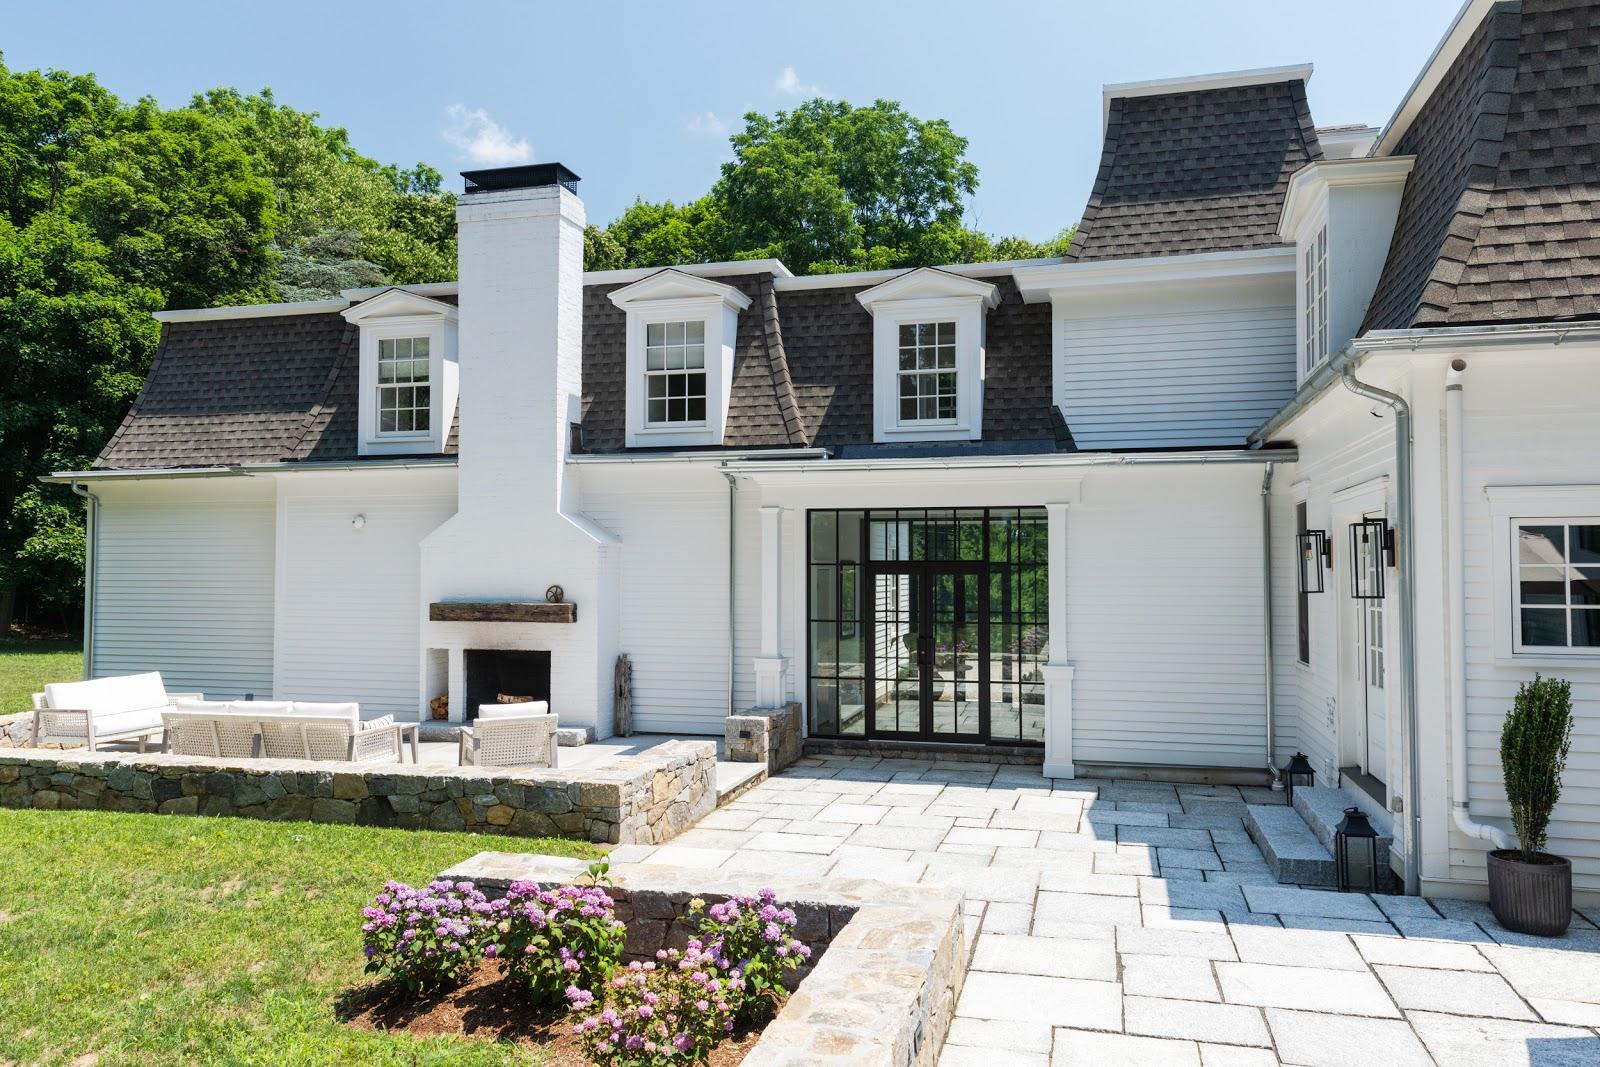 Eva Amurri backyard project with Swenson Granite